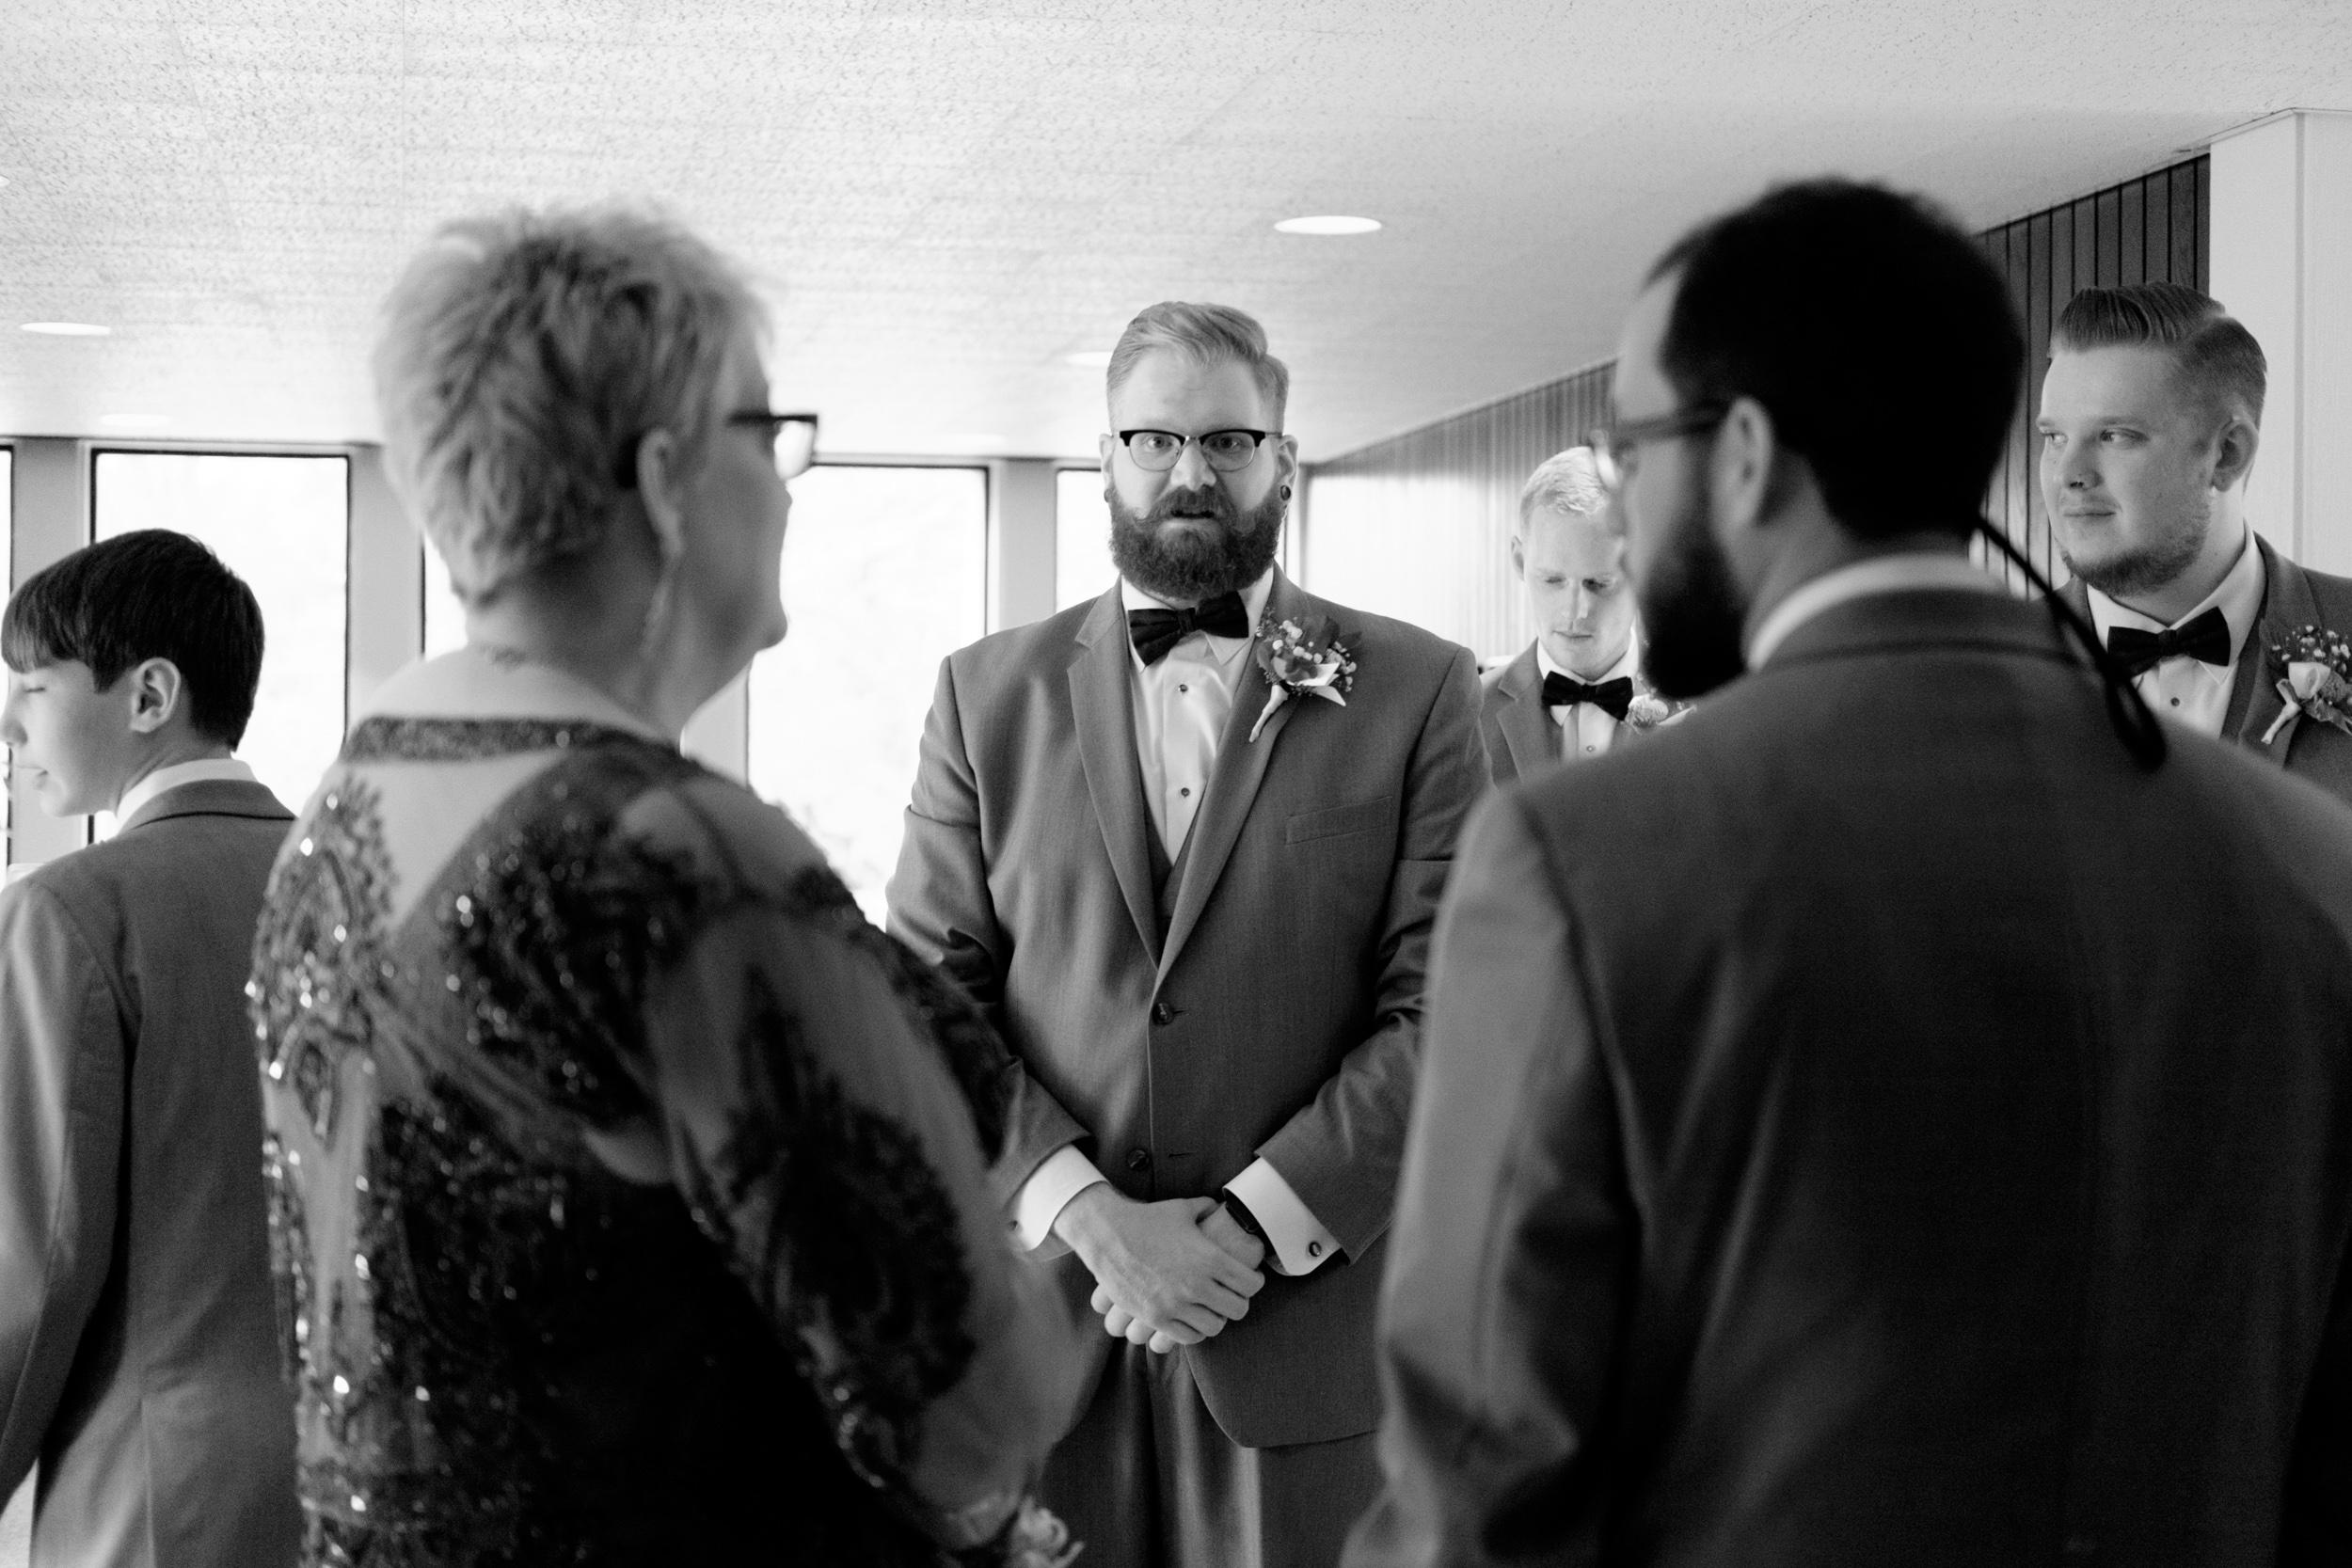 Christian & Sarah wedding photography by Brian milo-144.jpg